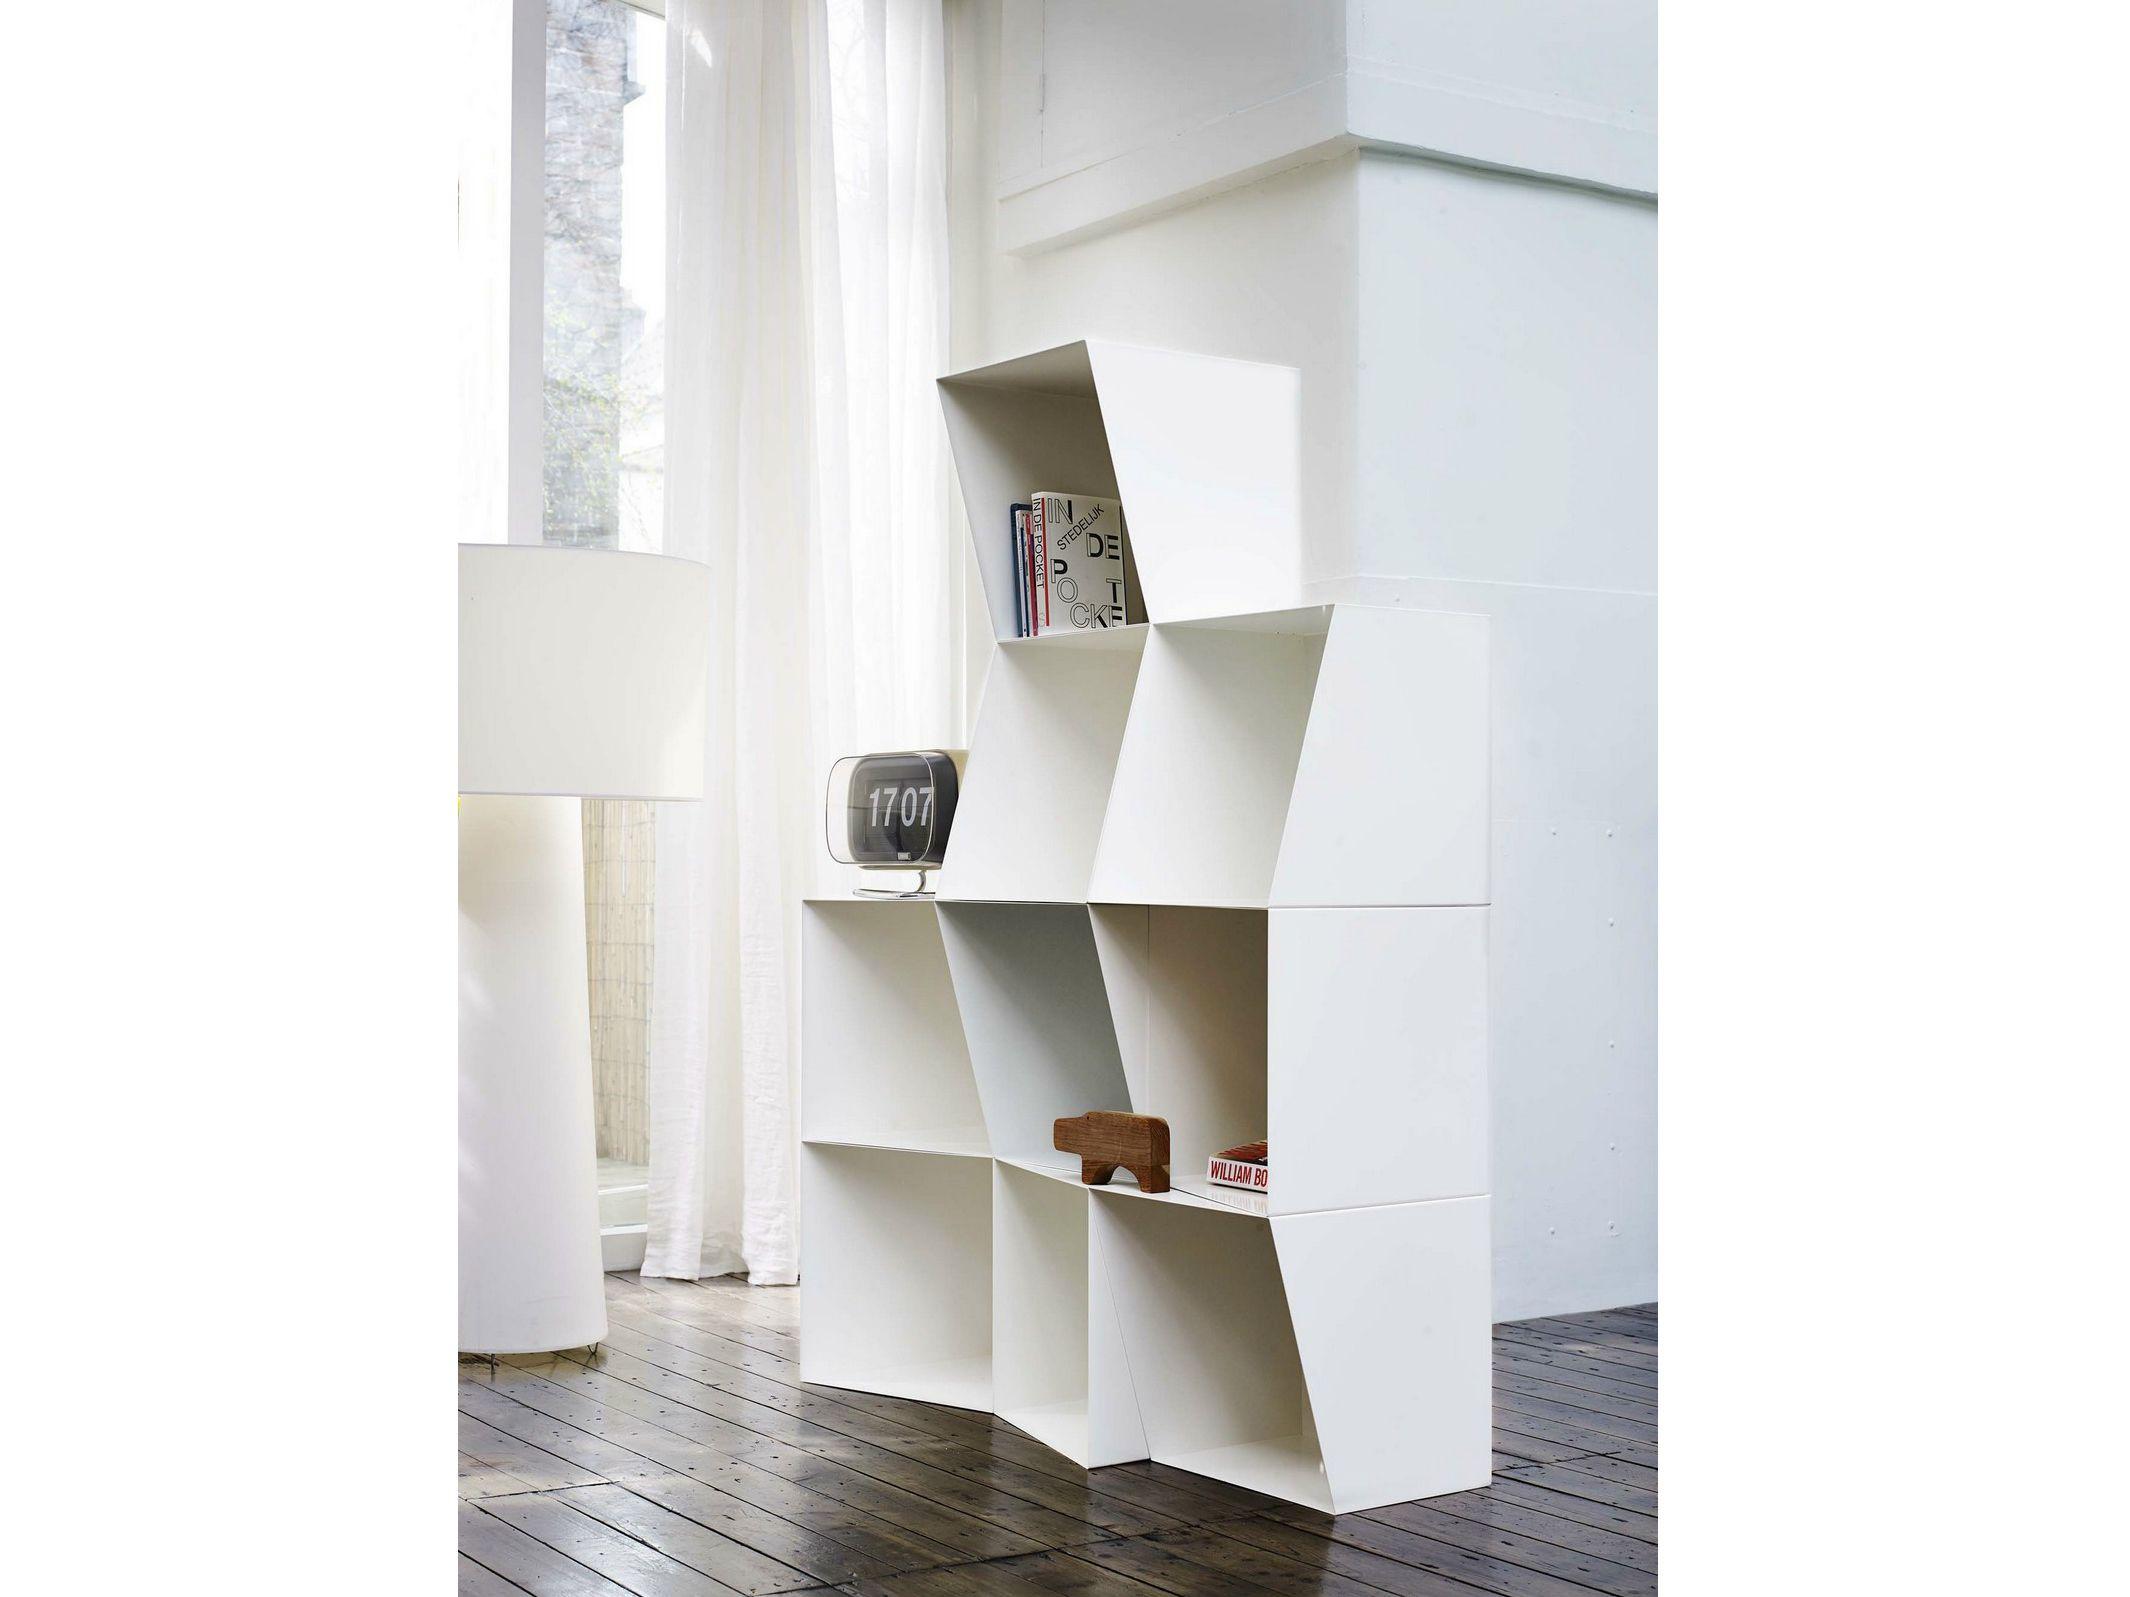 totem biblioth que by design by nico design nicolette de waart. Black Bedroom Furniture Sets. Home Design Ideas